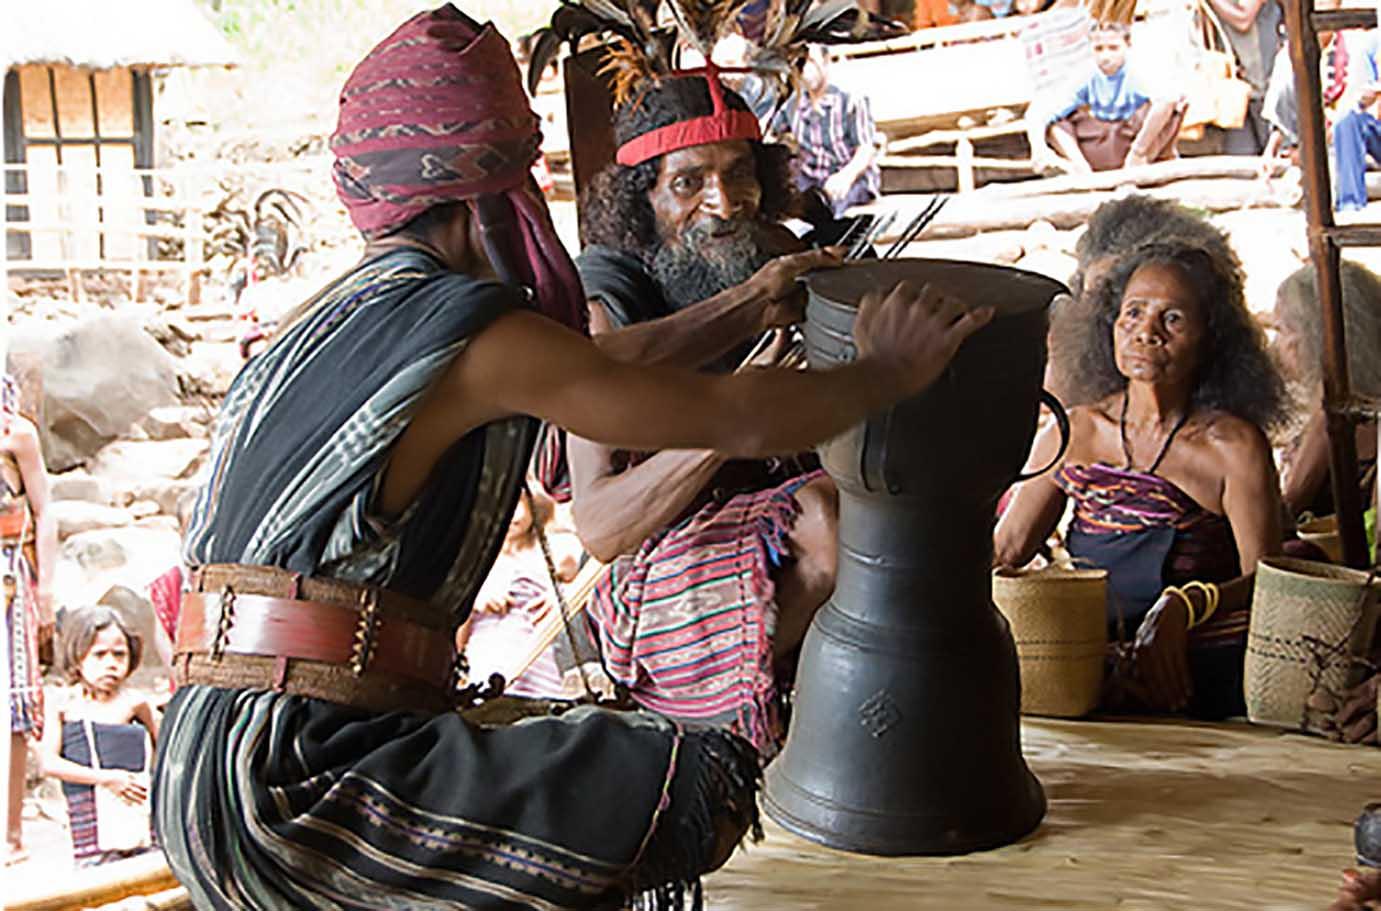 Moko, Alat Musik Tradisional Dari Pulau Alor Nusa Tenggara Timur (NTT)